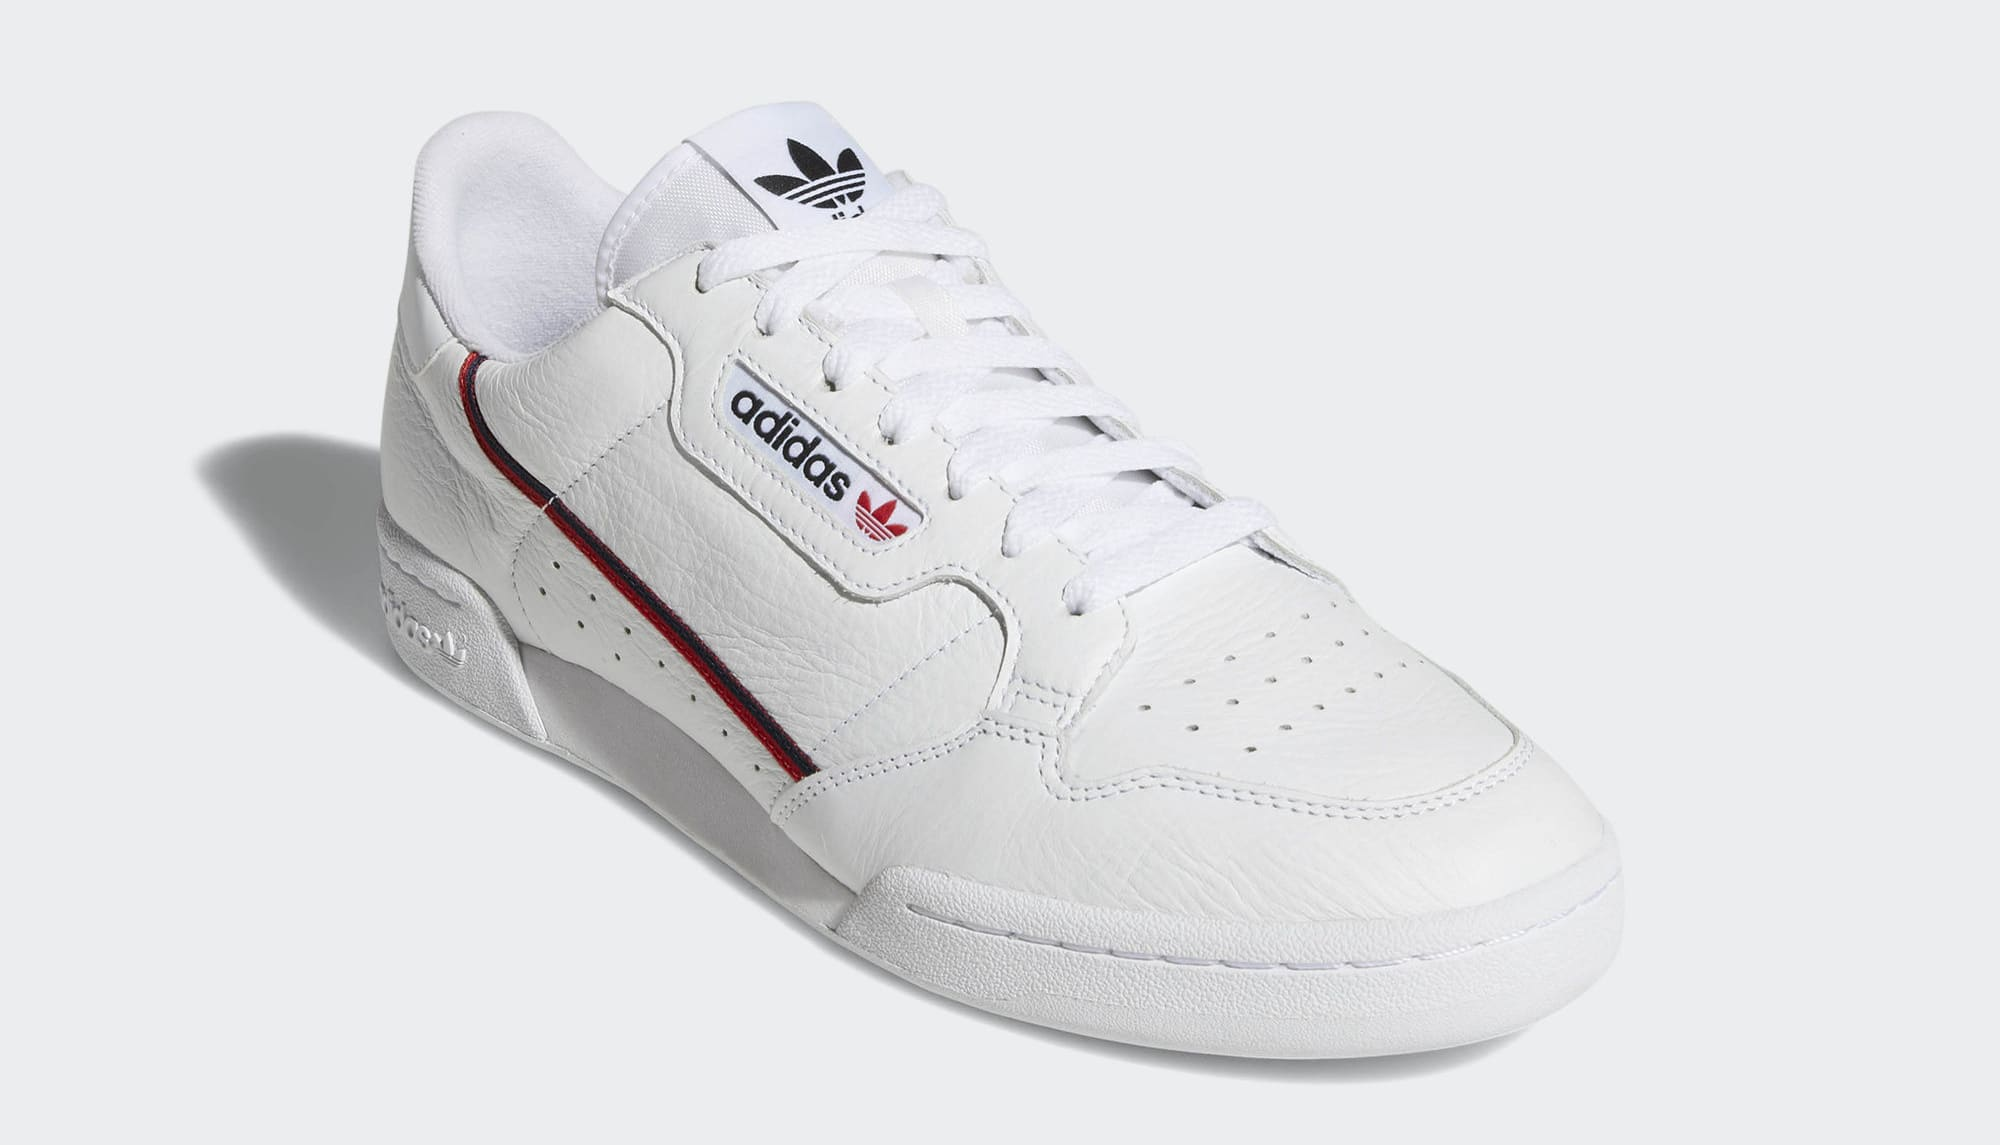 Adidas Continental 80 Rascal B41674 (Front)